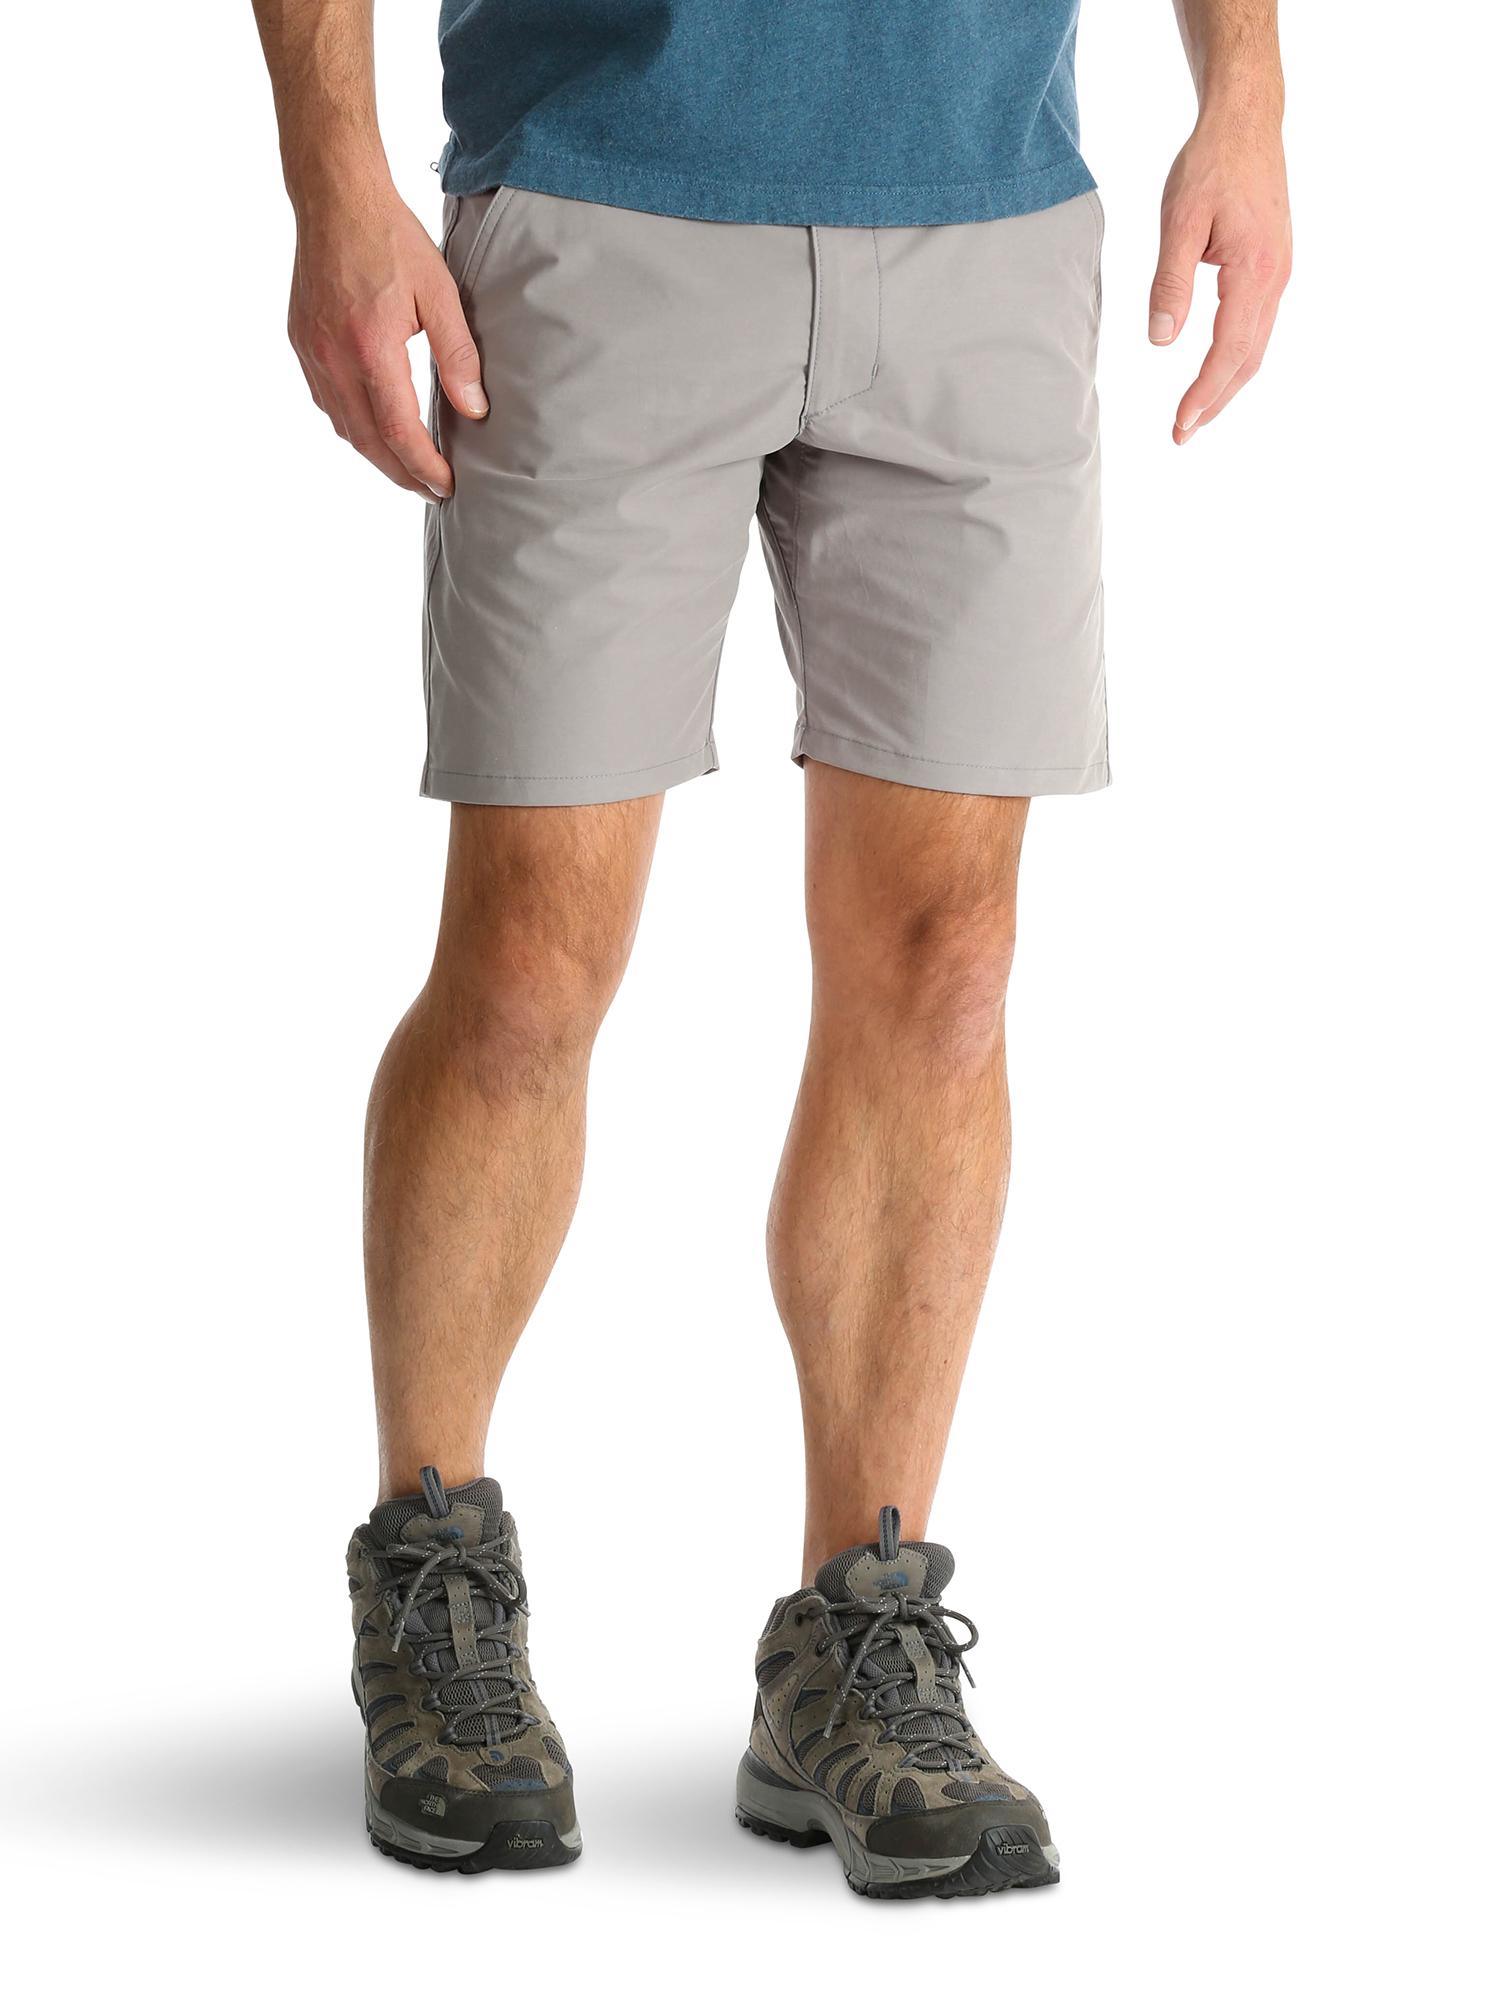 Men's Outdoor Back Elastic Flat Front Short